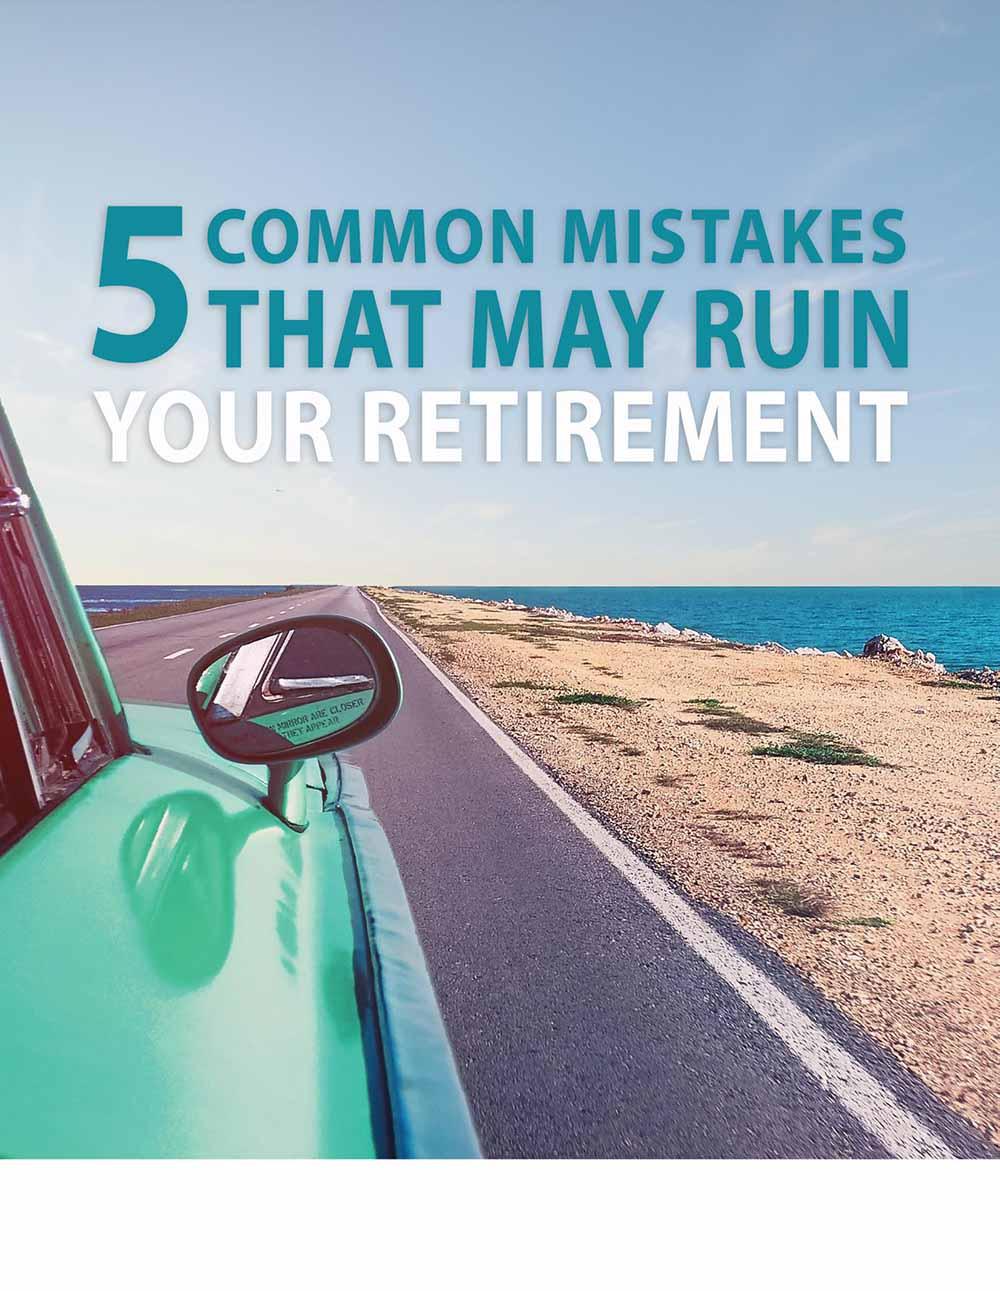 Common Mistakes in Retirement